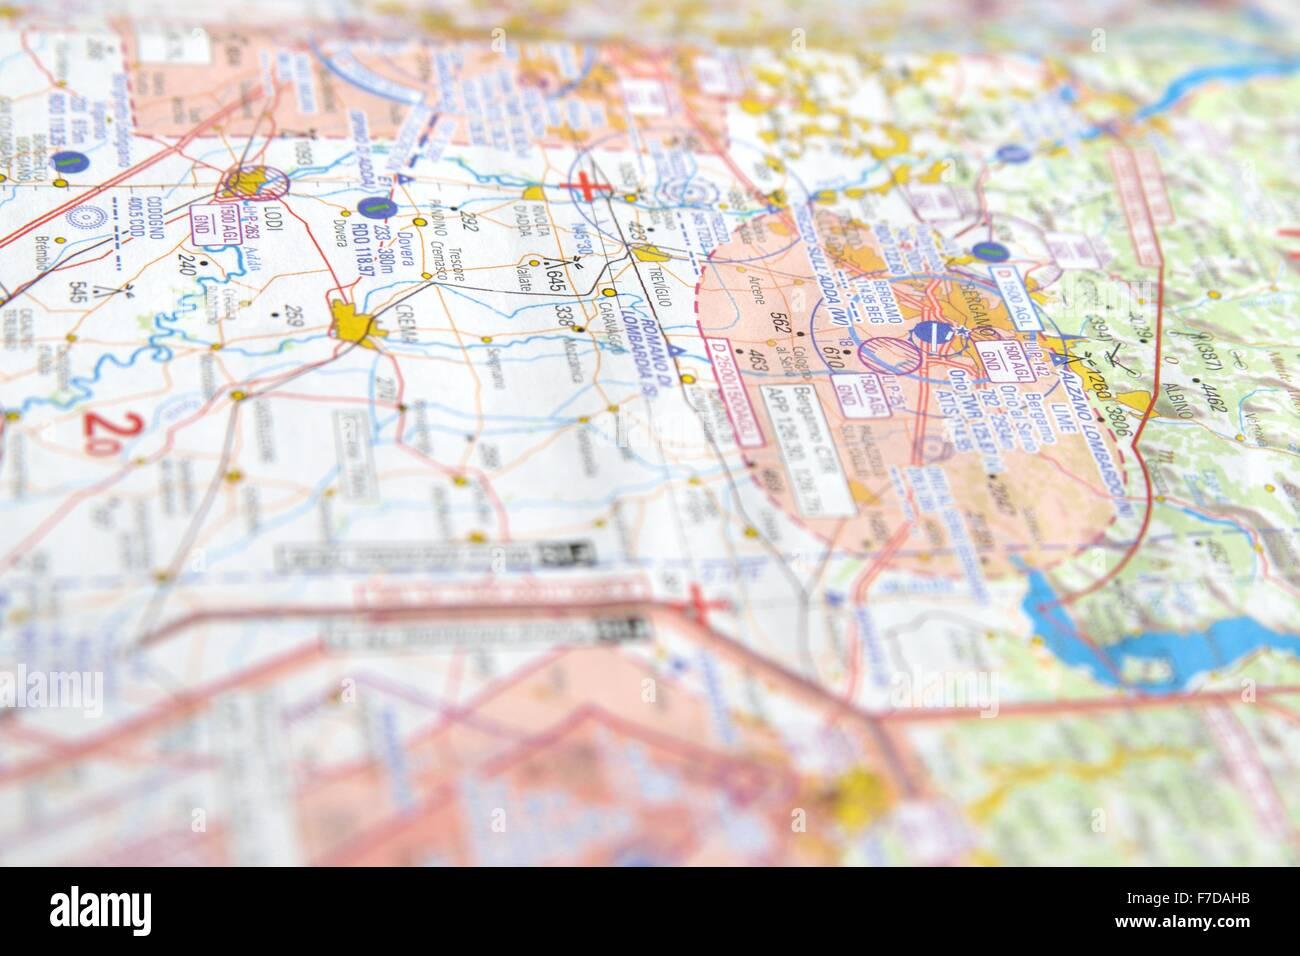 Aircraft navigation chart - Stock Image